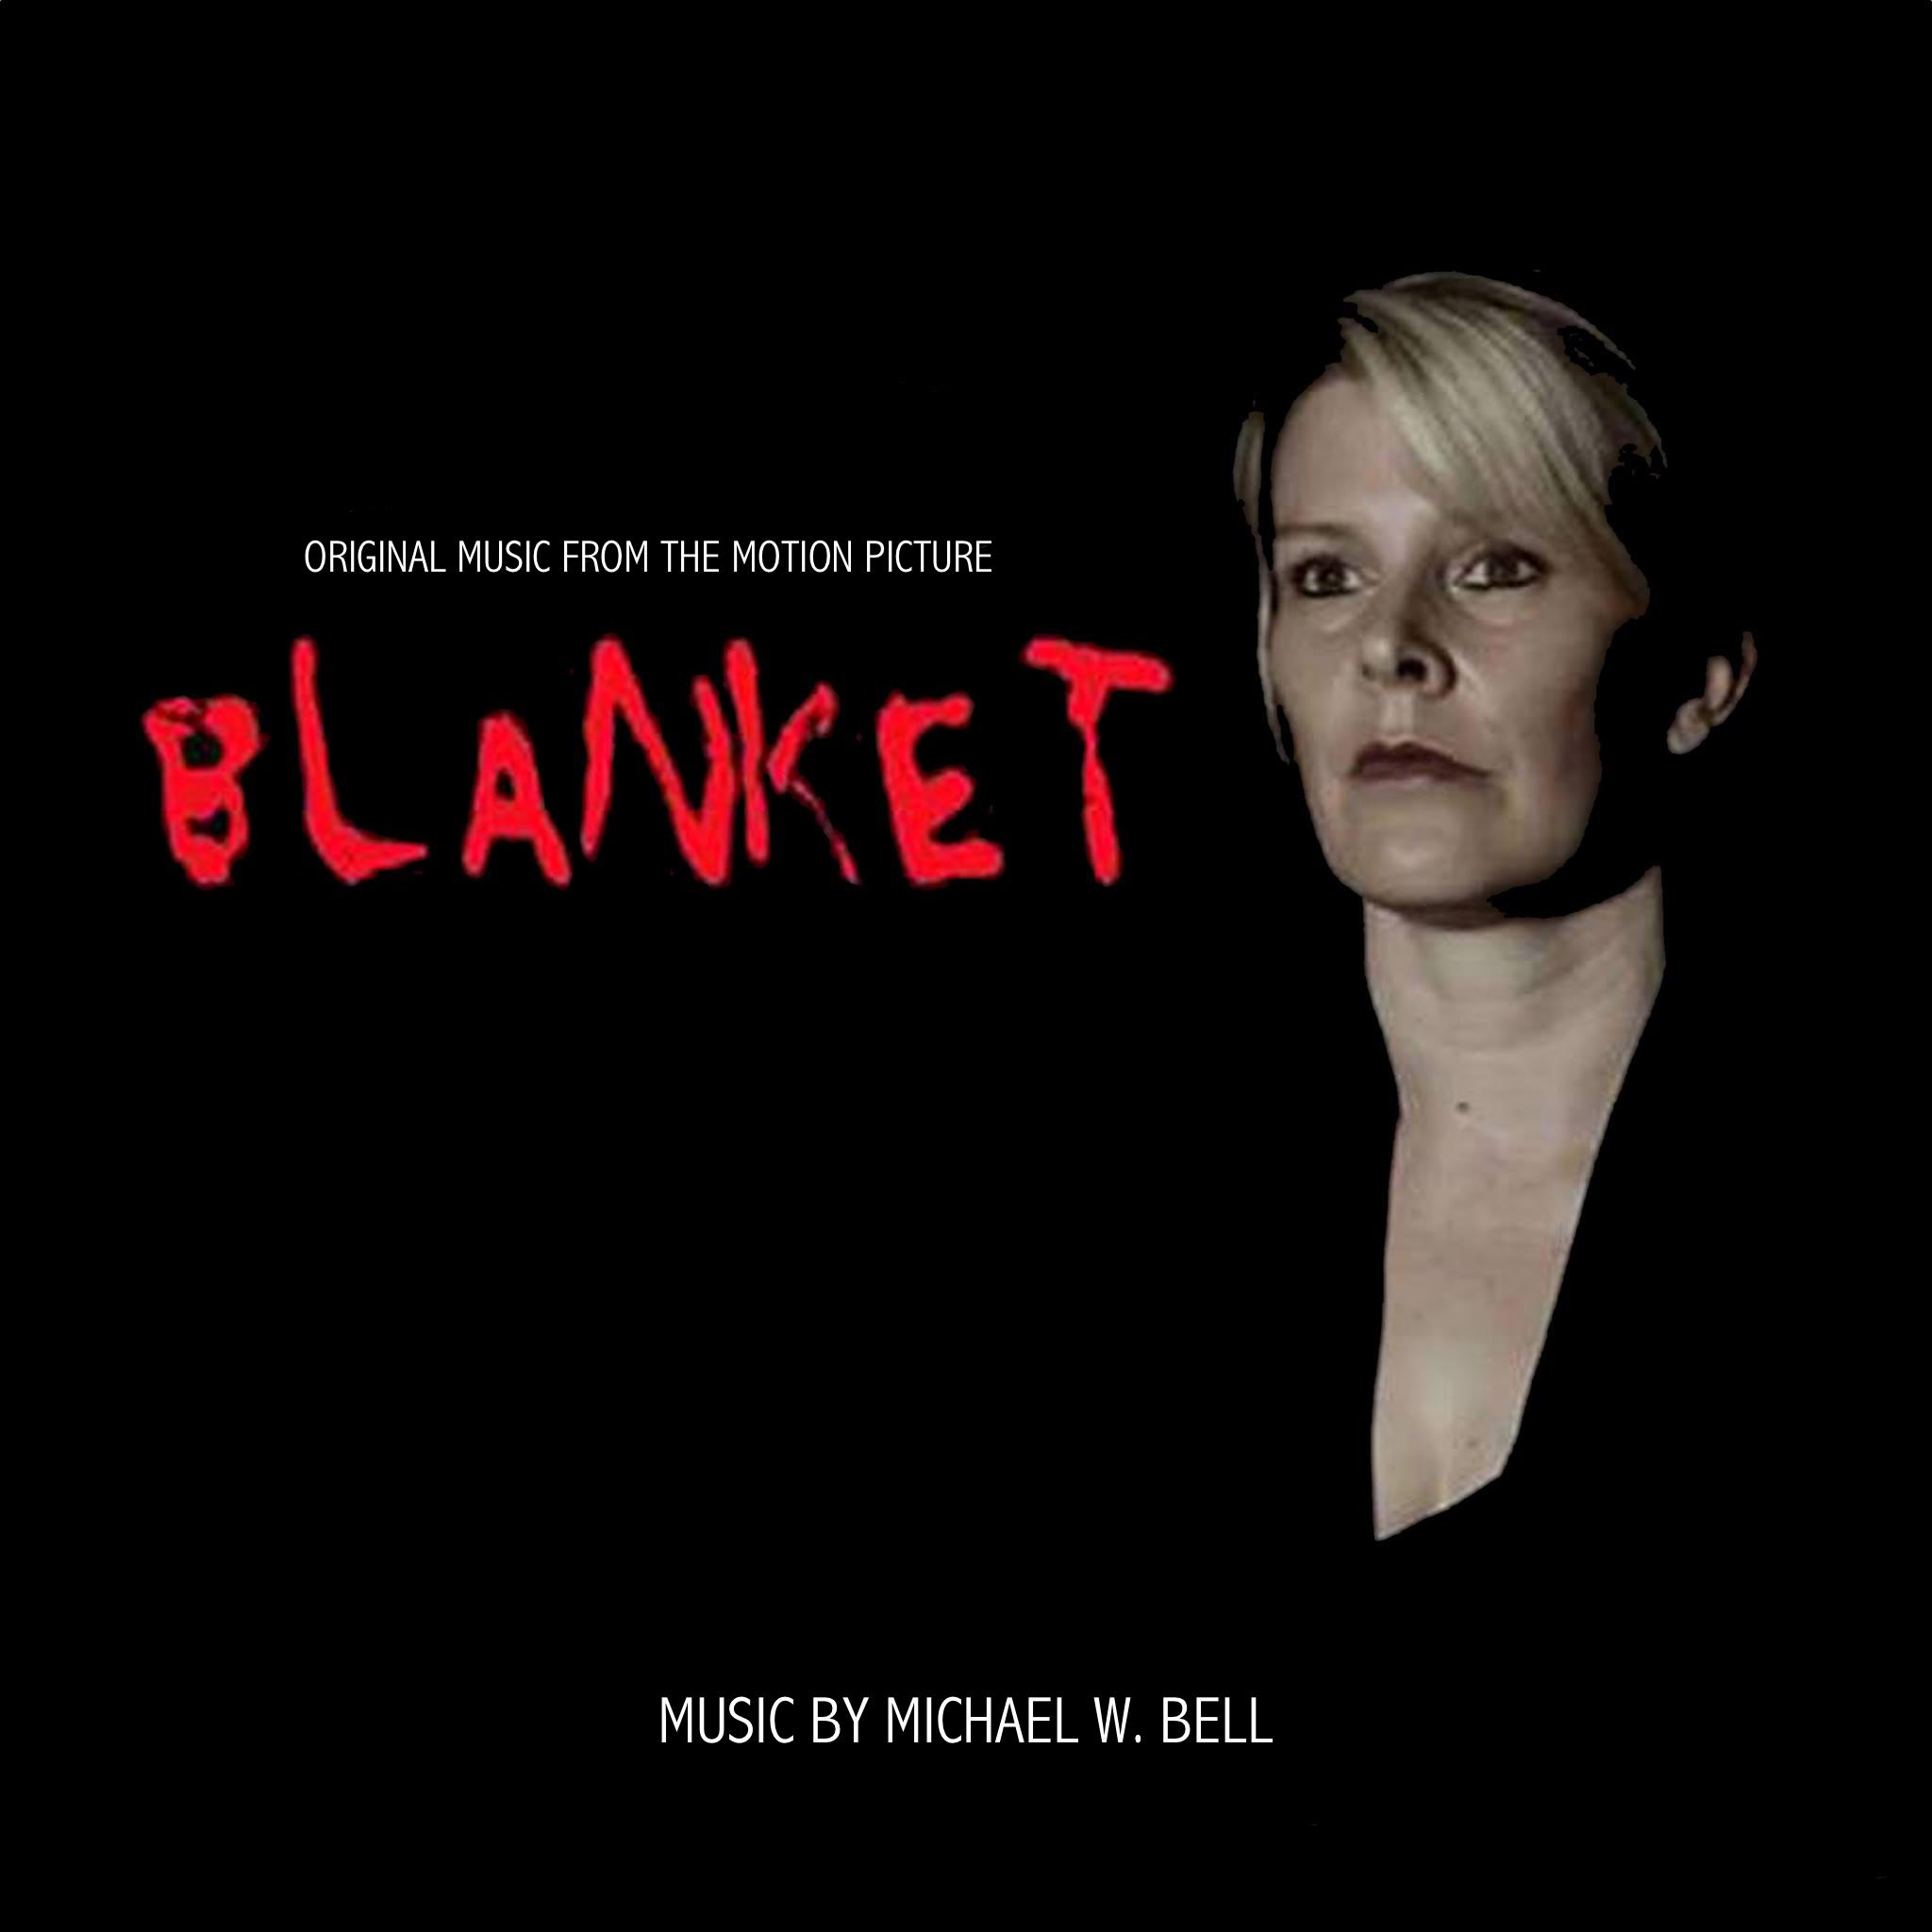 MICHAEL W. BELLBlanket (Original Motion Picture Score) - AEP0006 - LPGenre: Film ScoreReleased: 11.05.2016